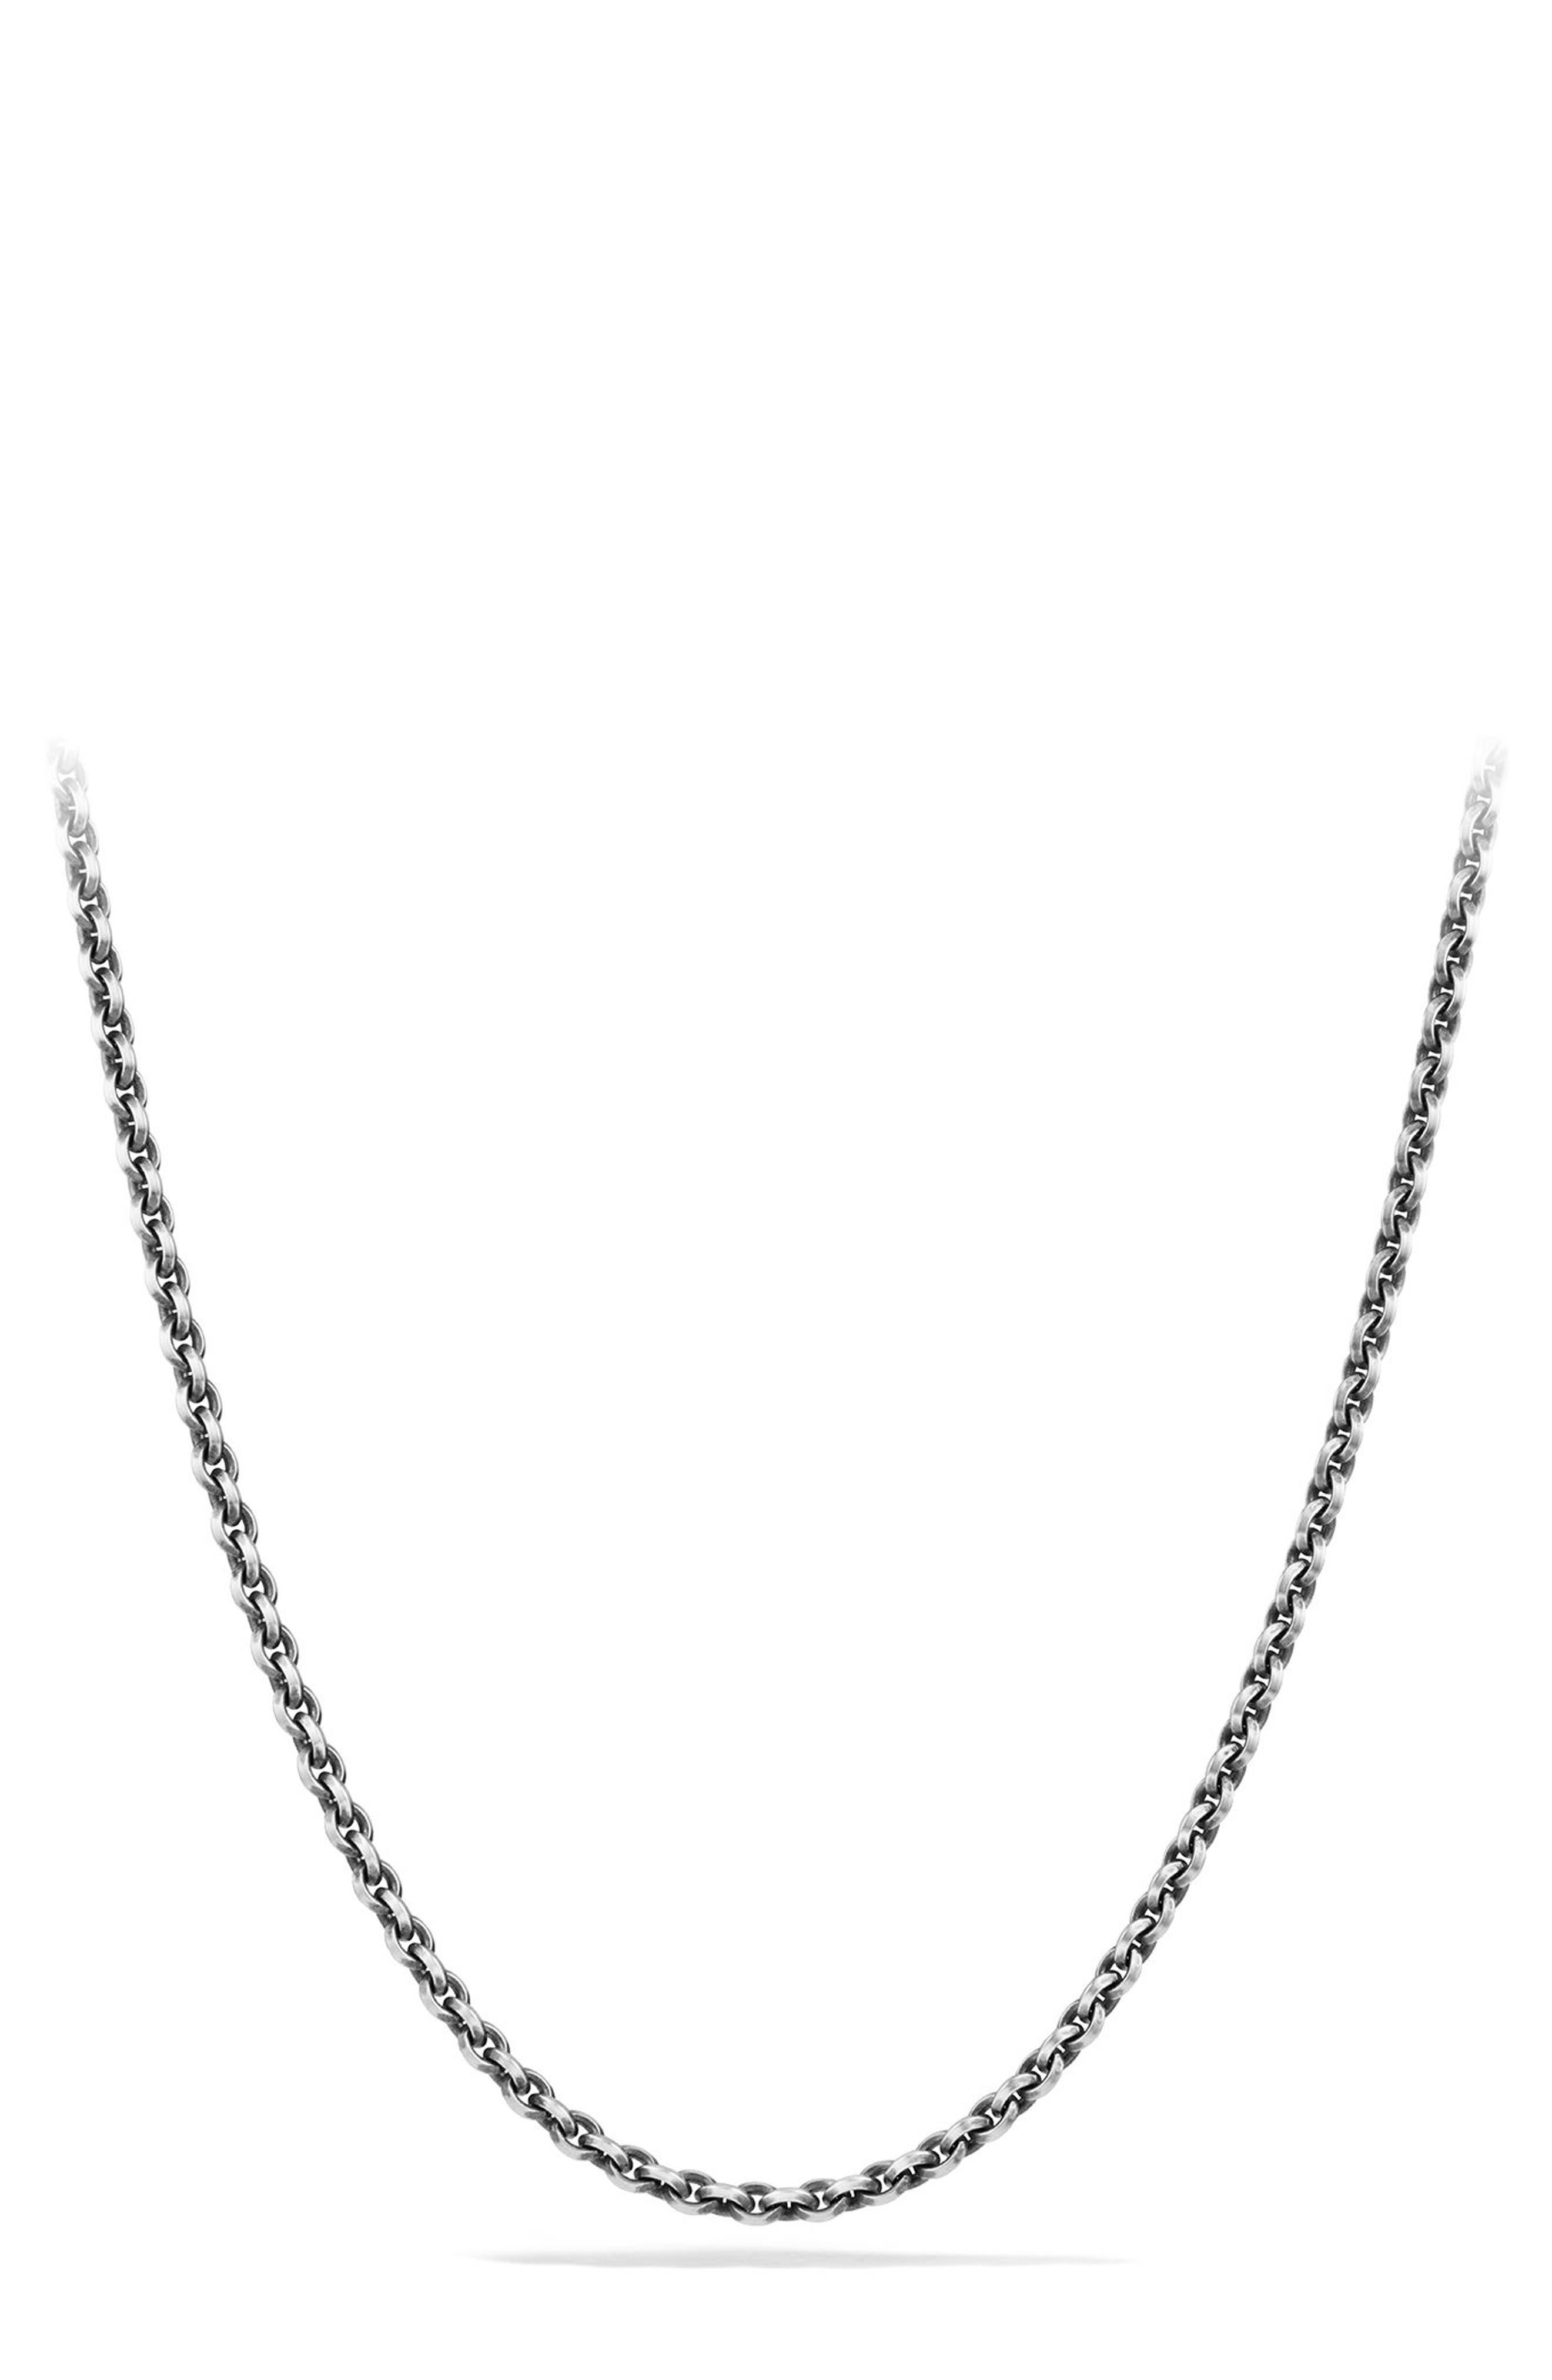 Knife Edge Chain Necklace,                             Main thumbnail 1, color,                             040